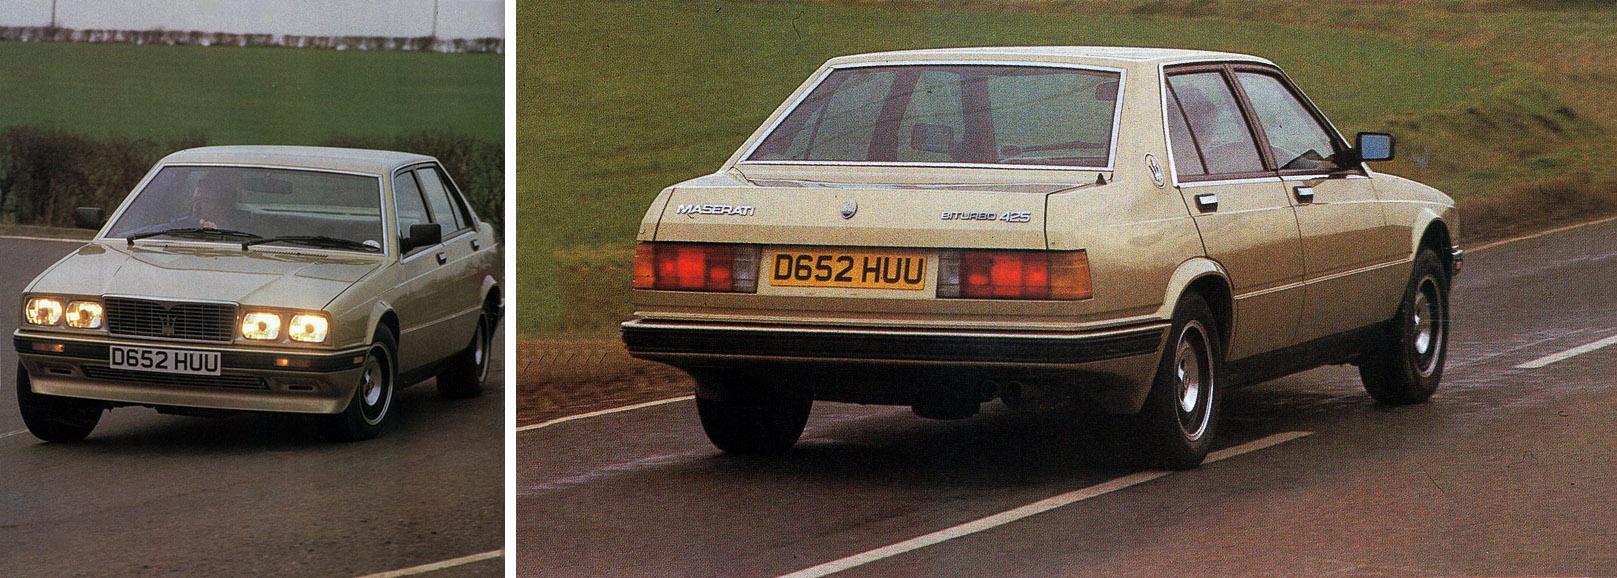 1987 Maserati Biturbo 425 - road test